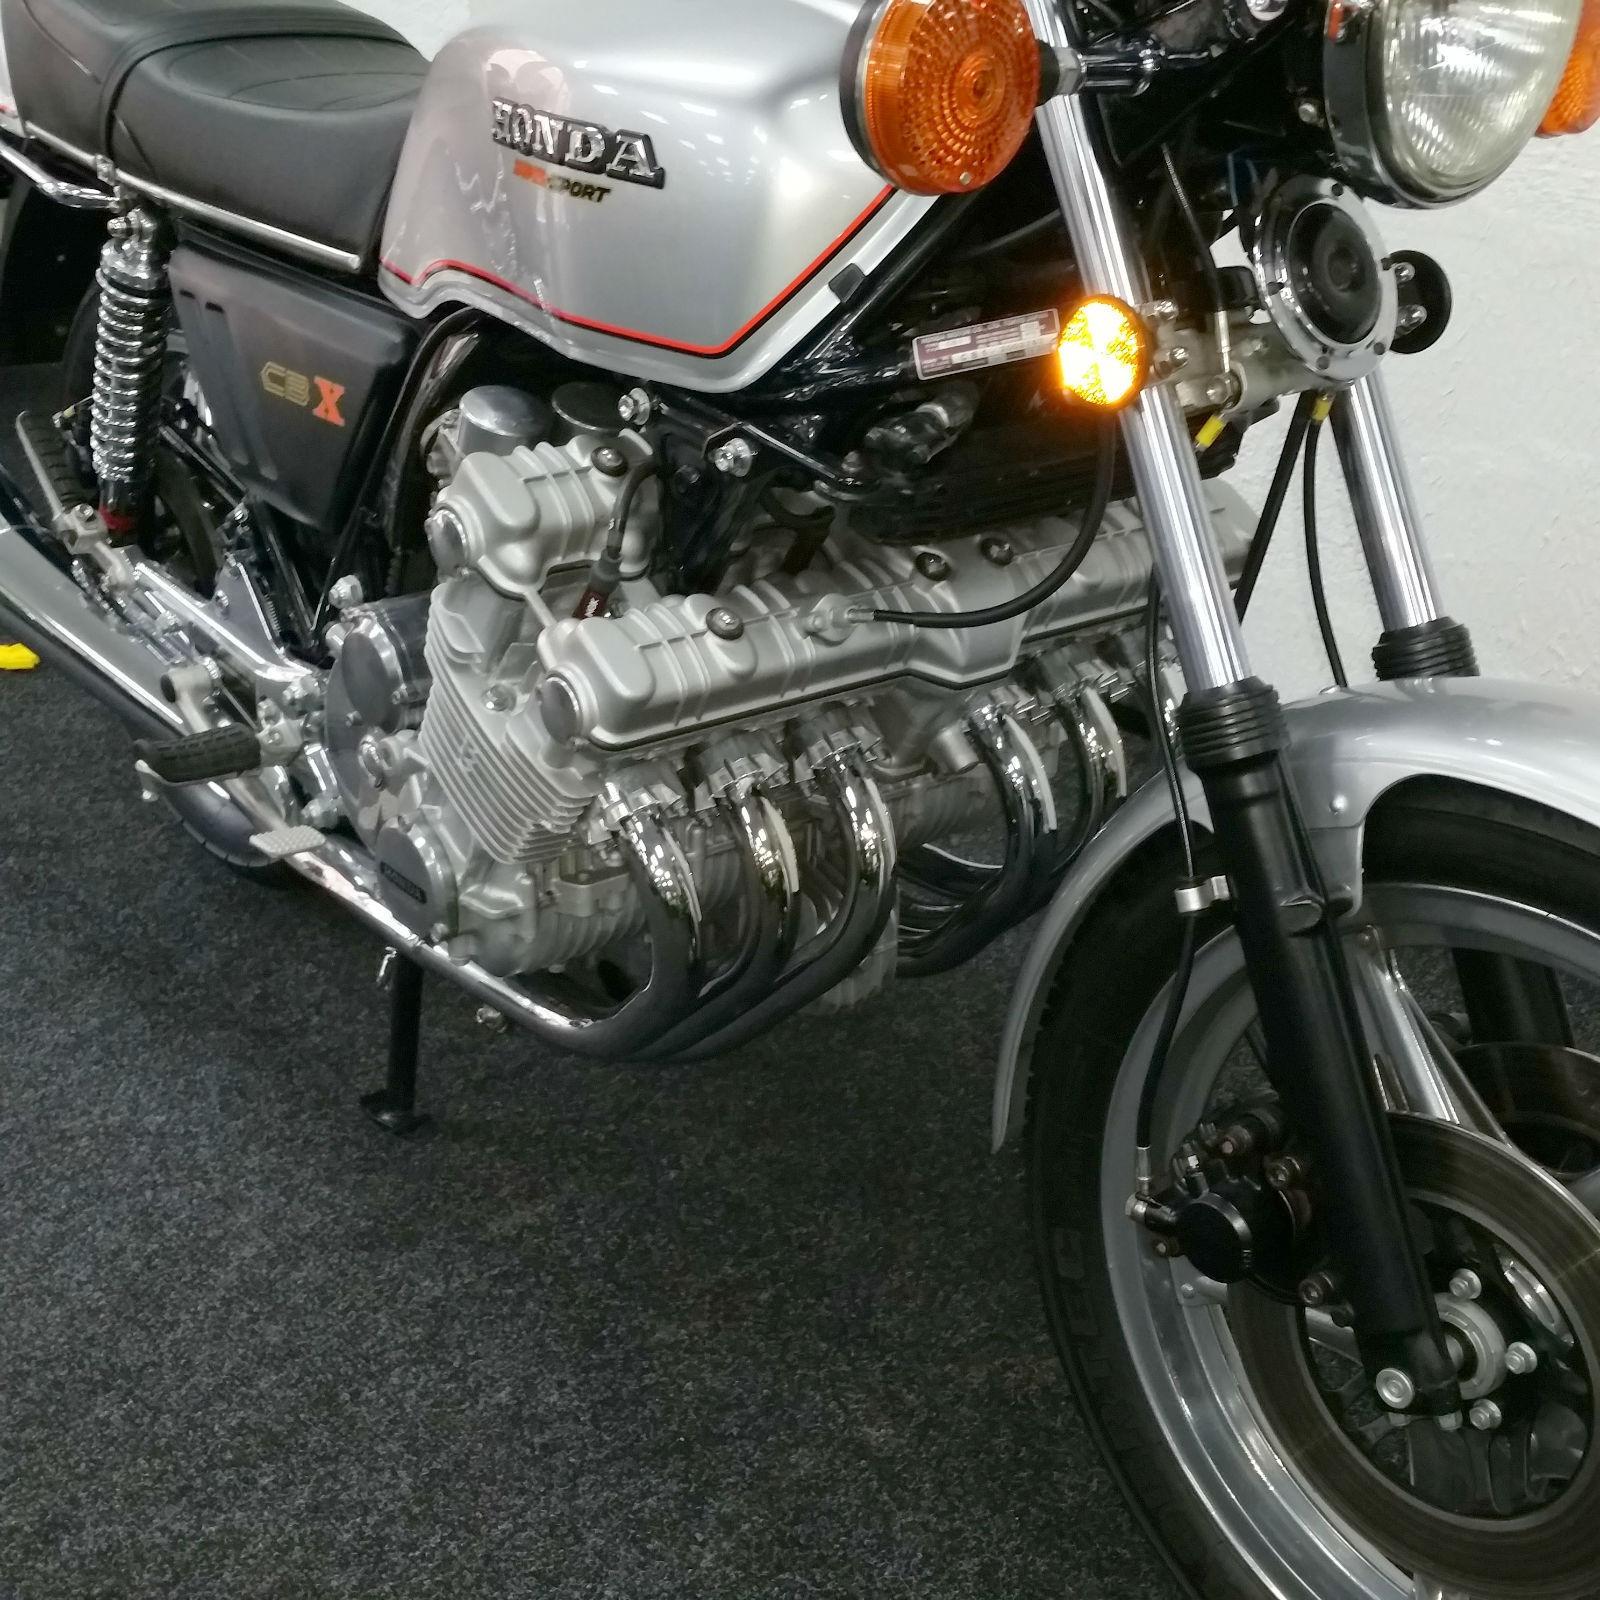 Honda CBX1000 - 1978 - Reflector, Engine Cam Cover, Forks and Frame.